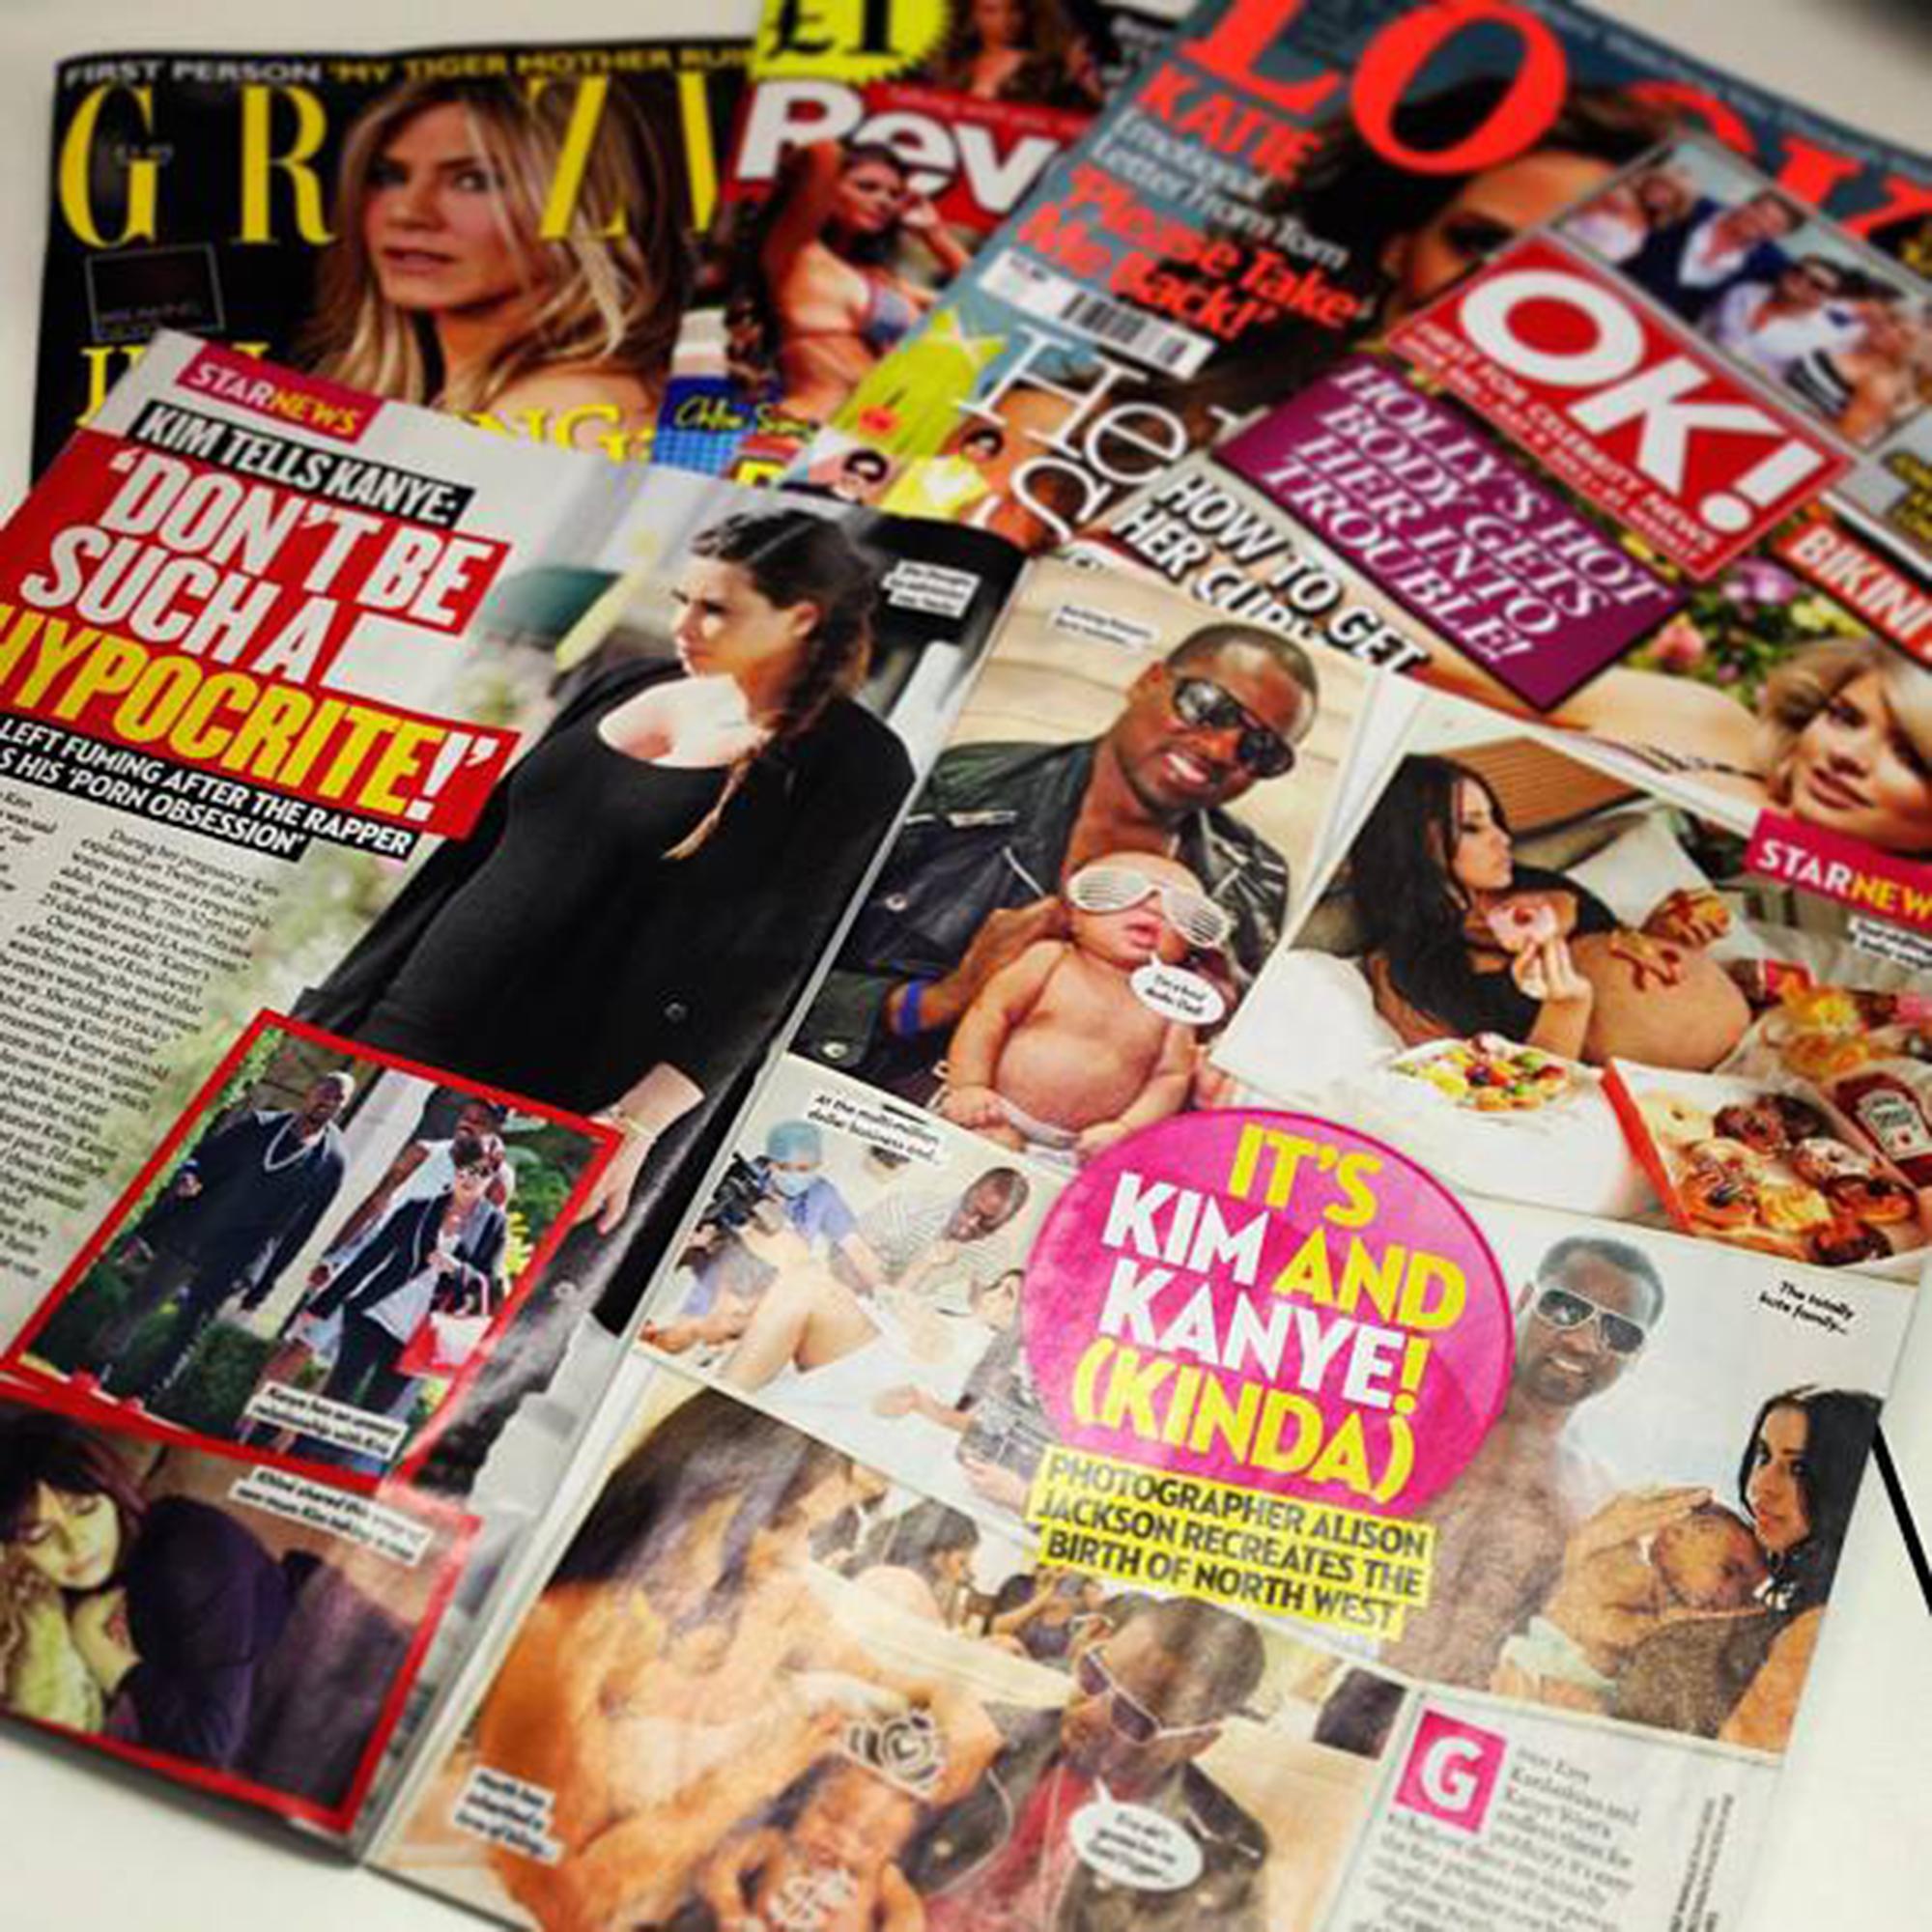 star_magazine_kim_kanye.jpg